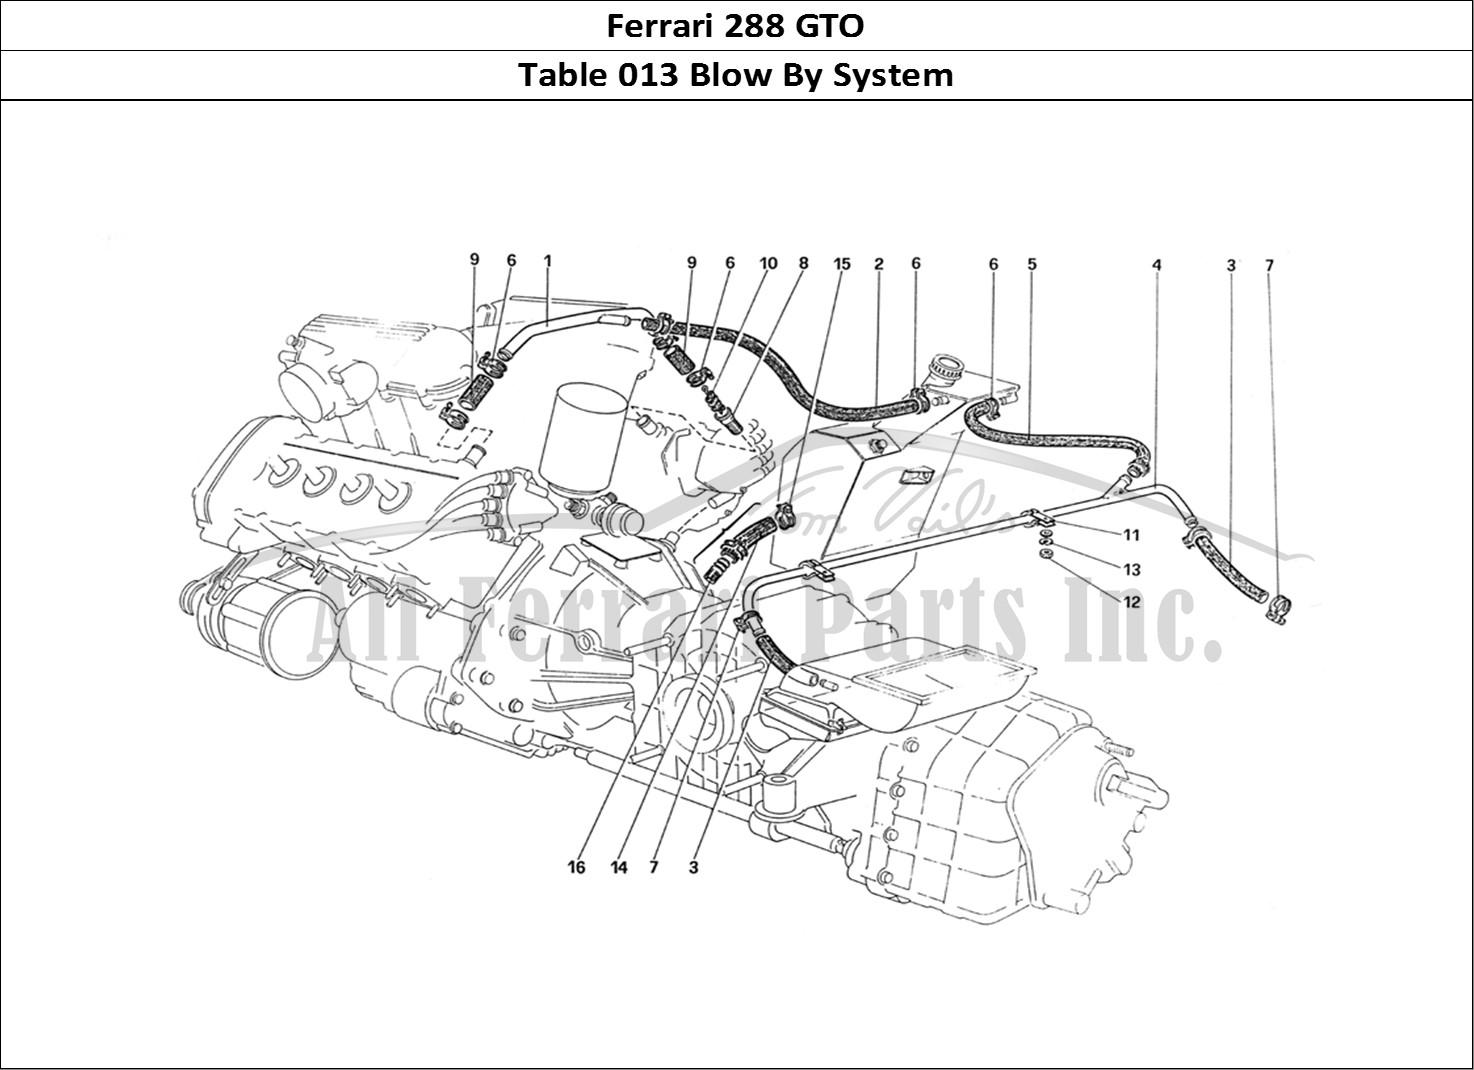 Buy original Ferrari 288 GTO 013 Blow By System Ferrari